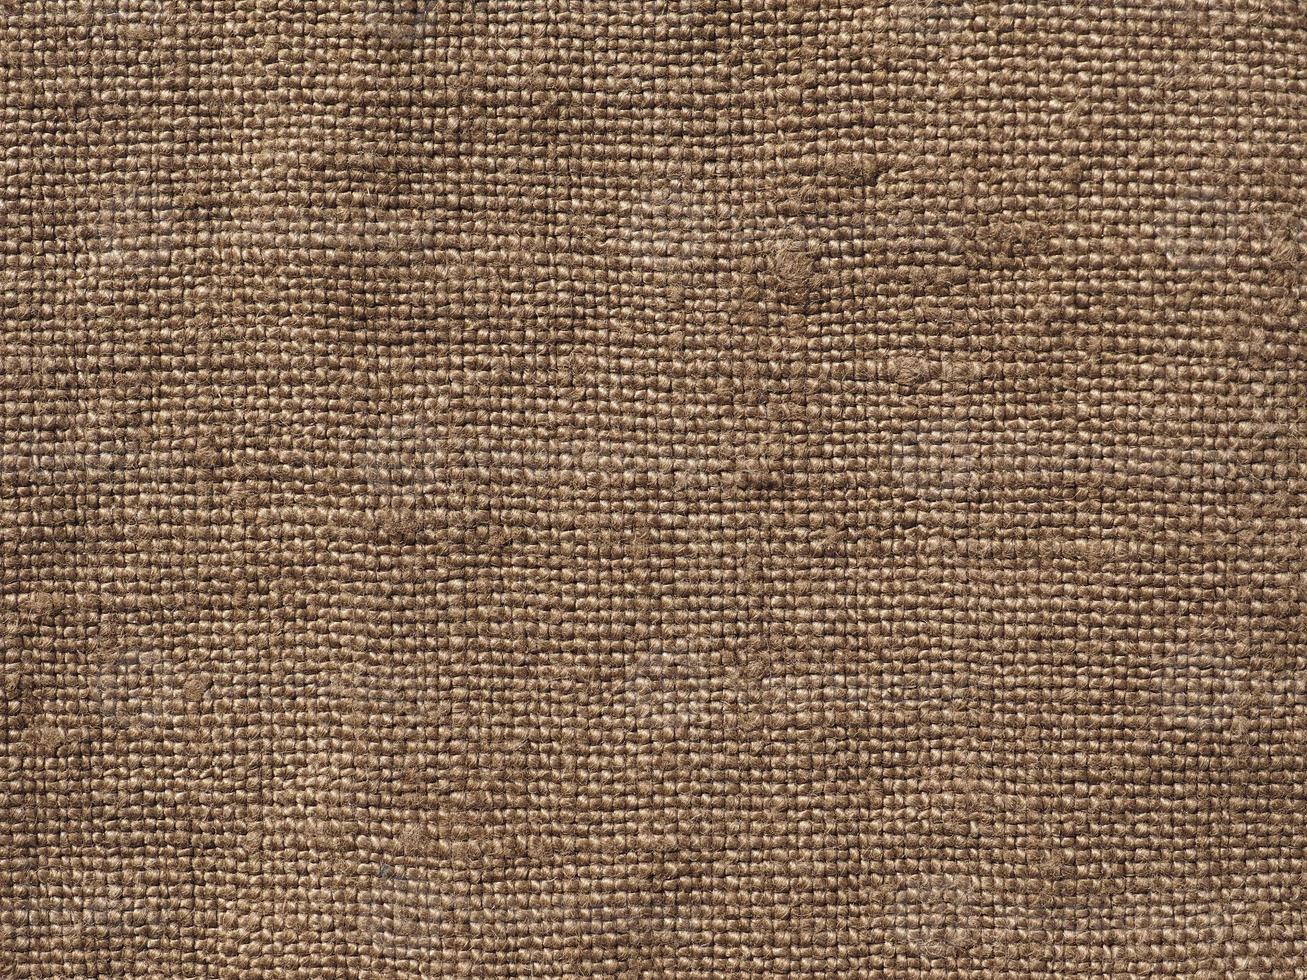 amostra de amostra de tecido marrom foto